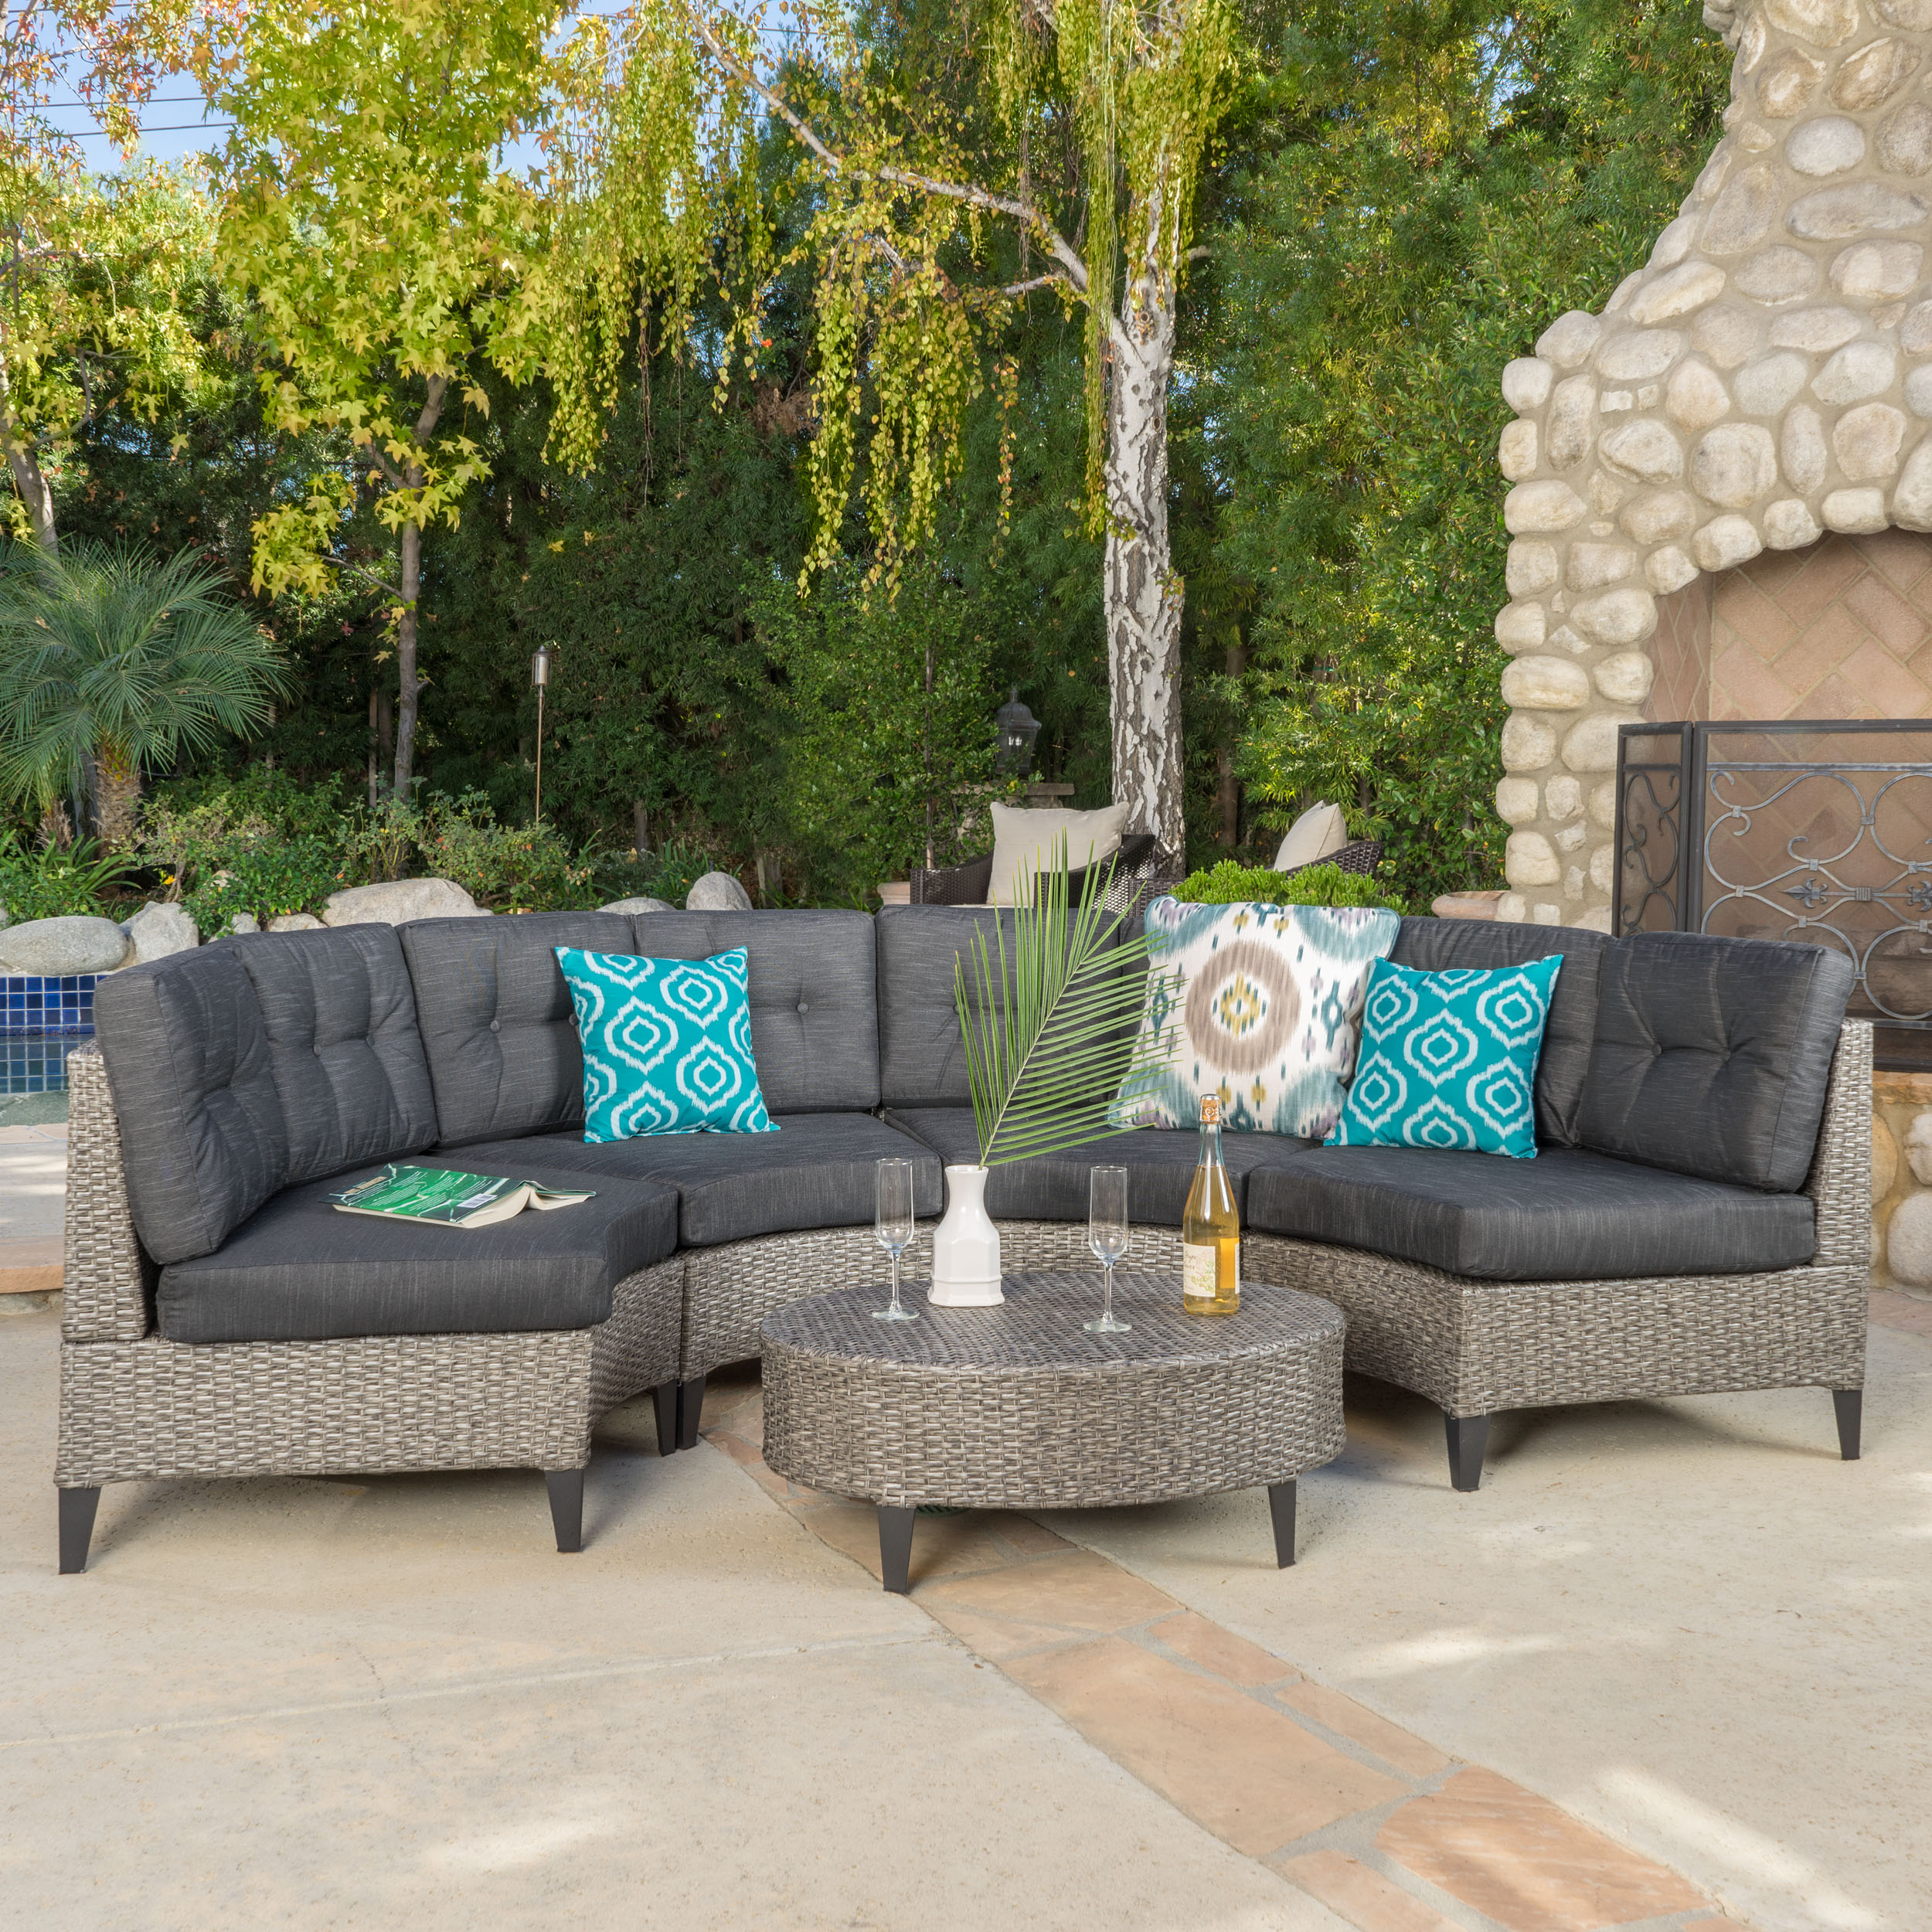 Manteo Outdoor 5 Piece Wicker Sofa Set with Cushions, Mixed Black, Dark Grey